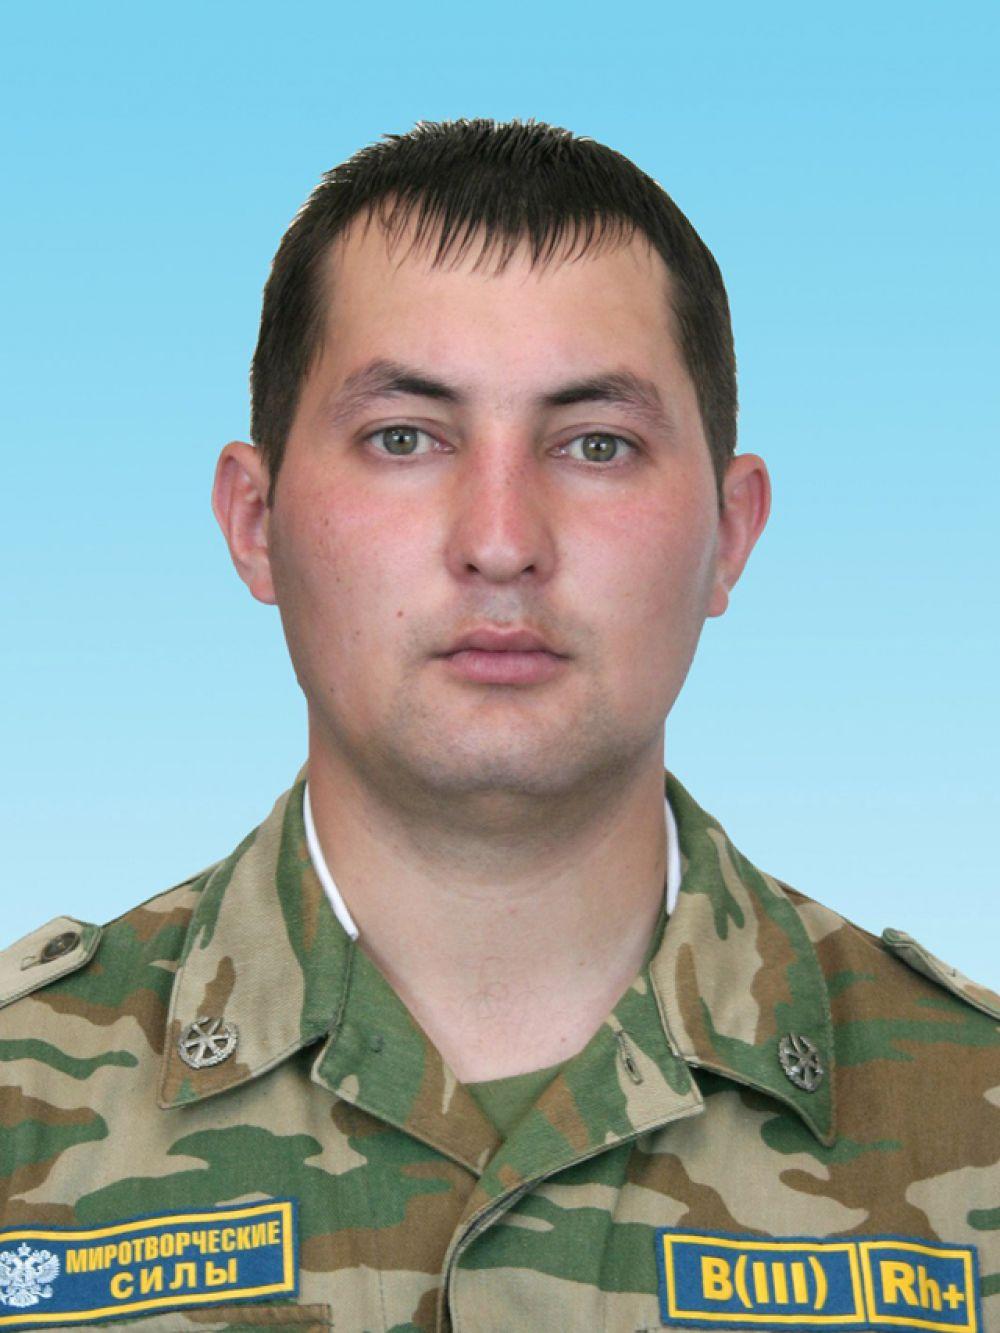 Марат Ахметшин служил в составе миротворческих сил во время грузино-осетинского конфликта, с 2005 по 2008 годы.